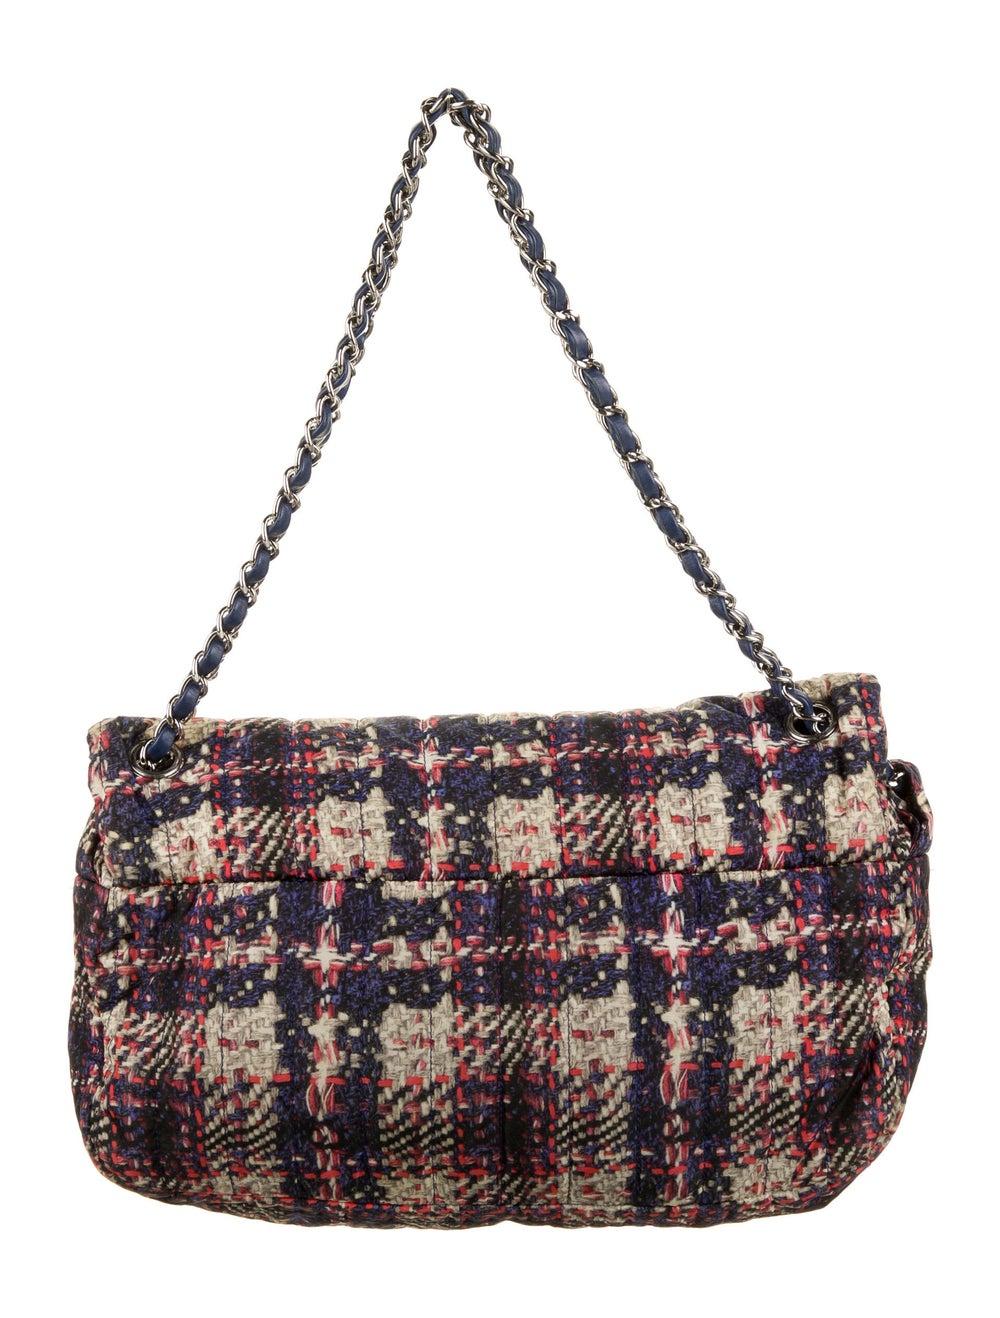 Chanel Medium Nylon Tweed Flap Bag Blue - image 4